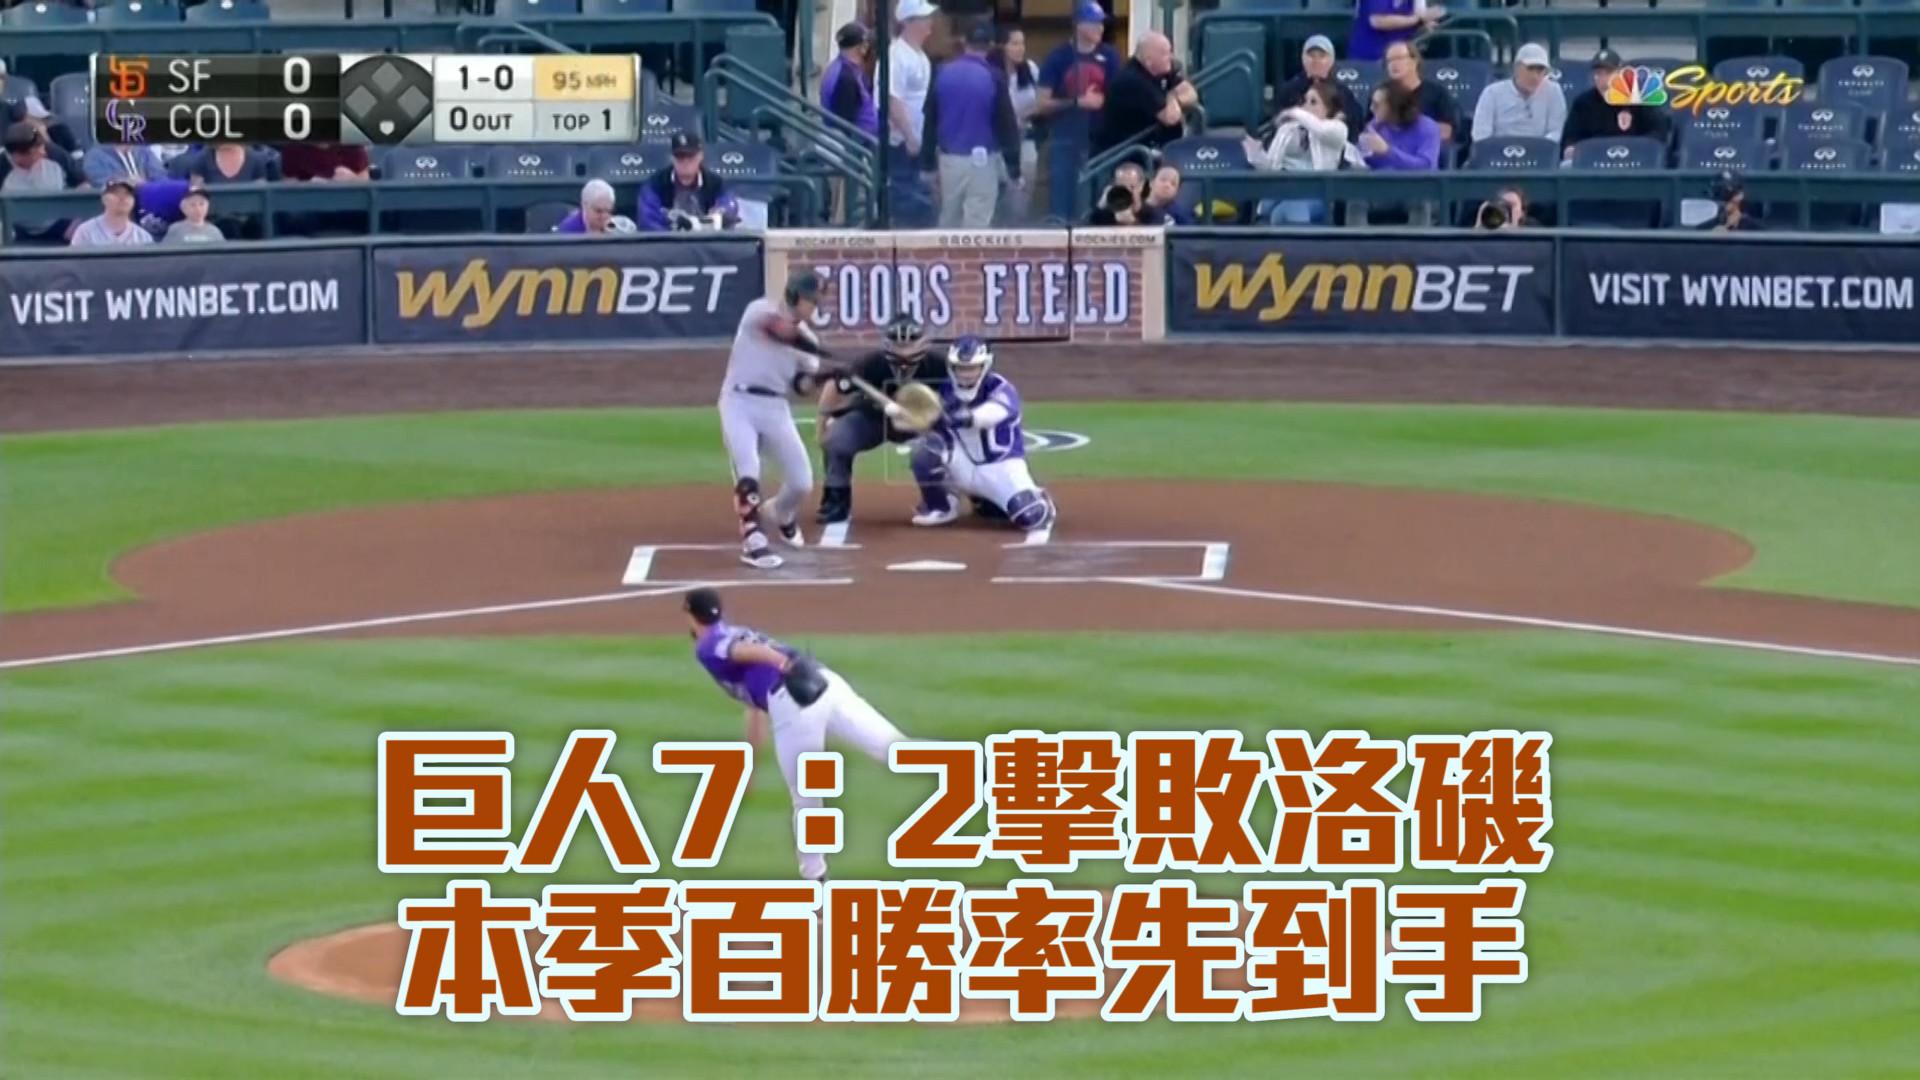 【MLB看愛爾達】巨人7:2擊敗洛磯 本季百勝率先到手 9/25